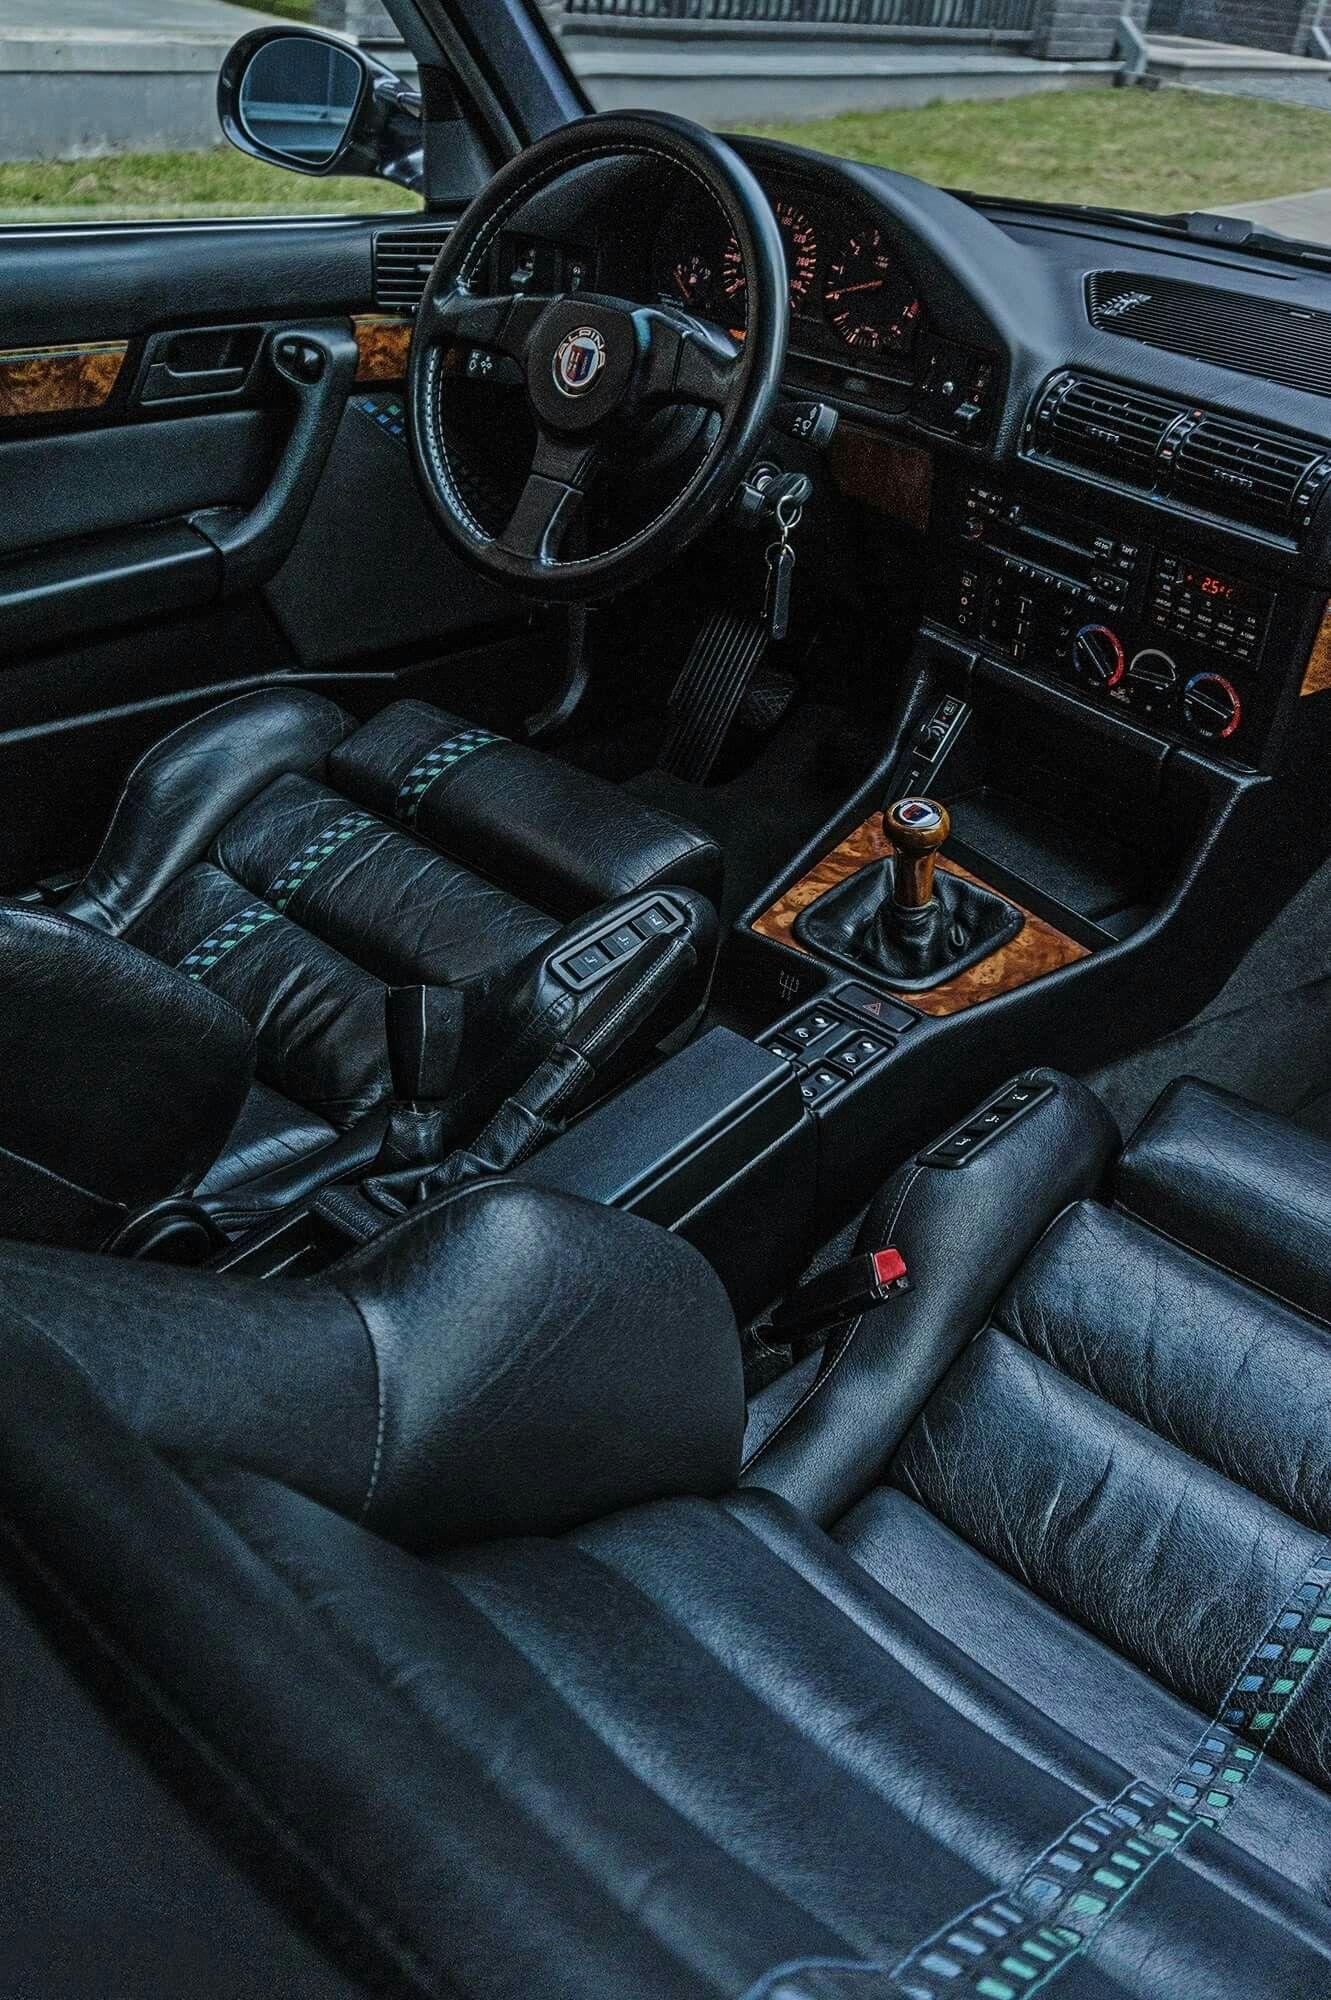 BMW Van Nuys >> Alpina E32 interior | bmw | Tapiceria automotriz, Autos ...